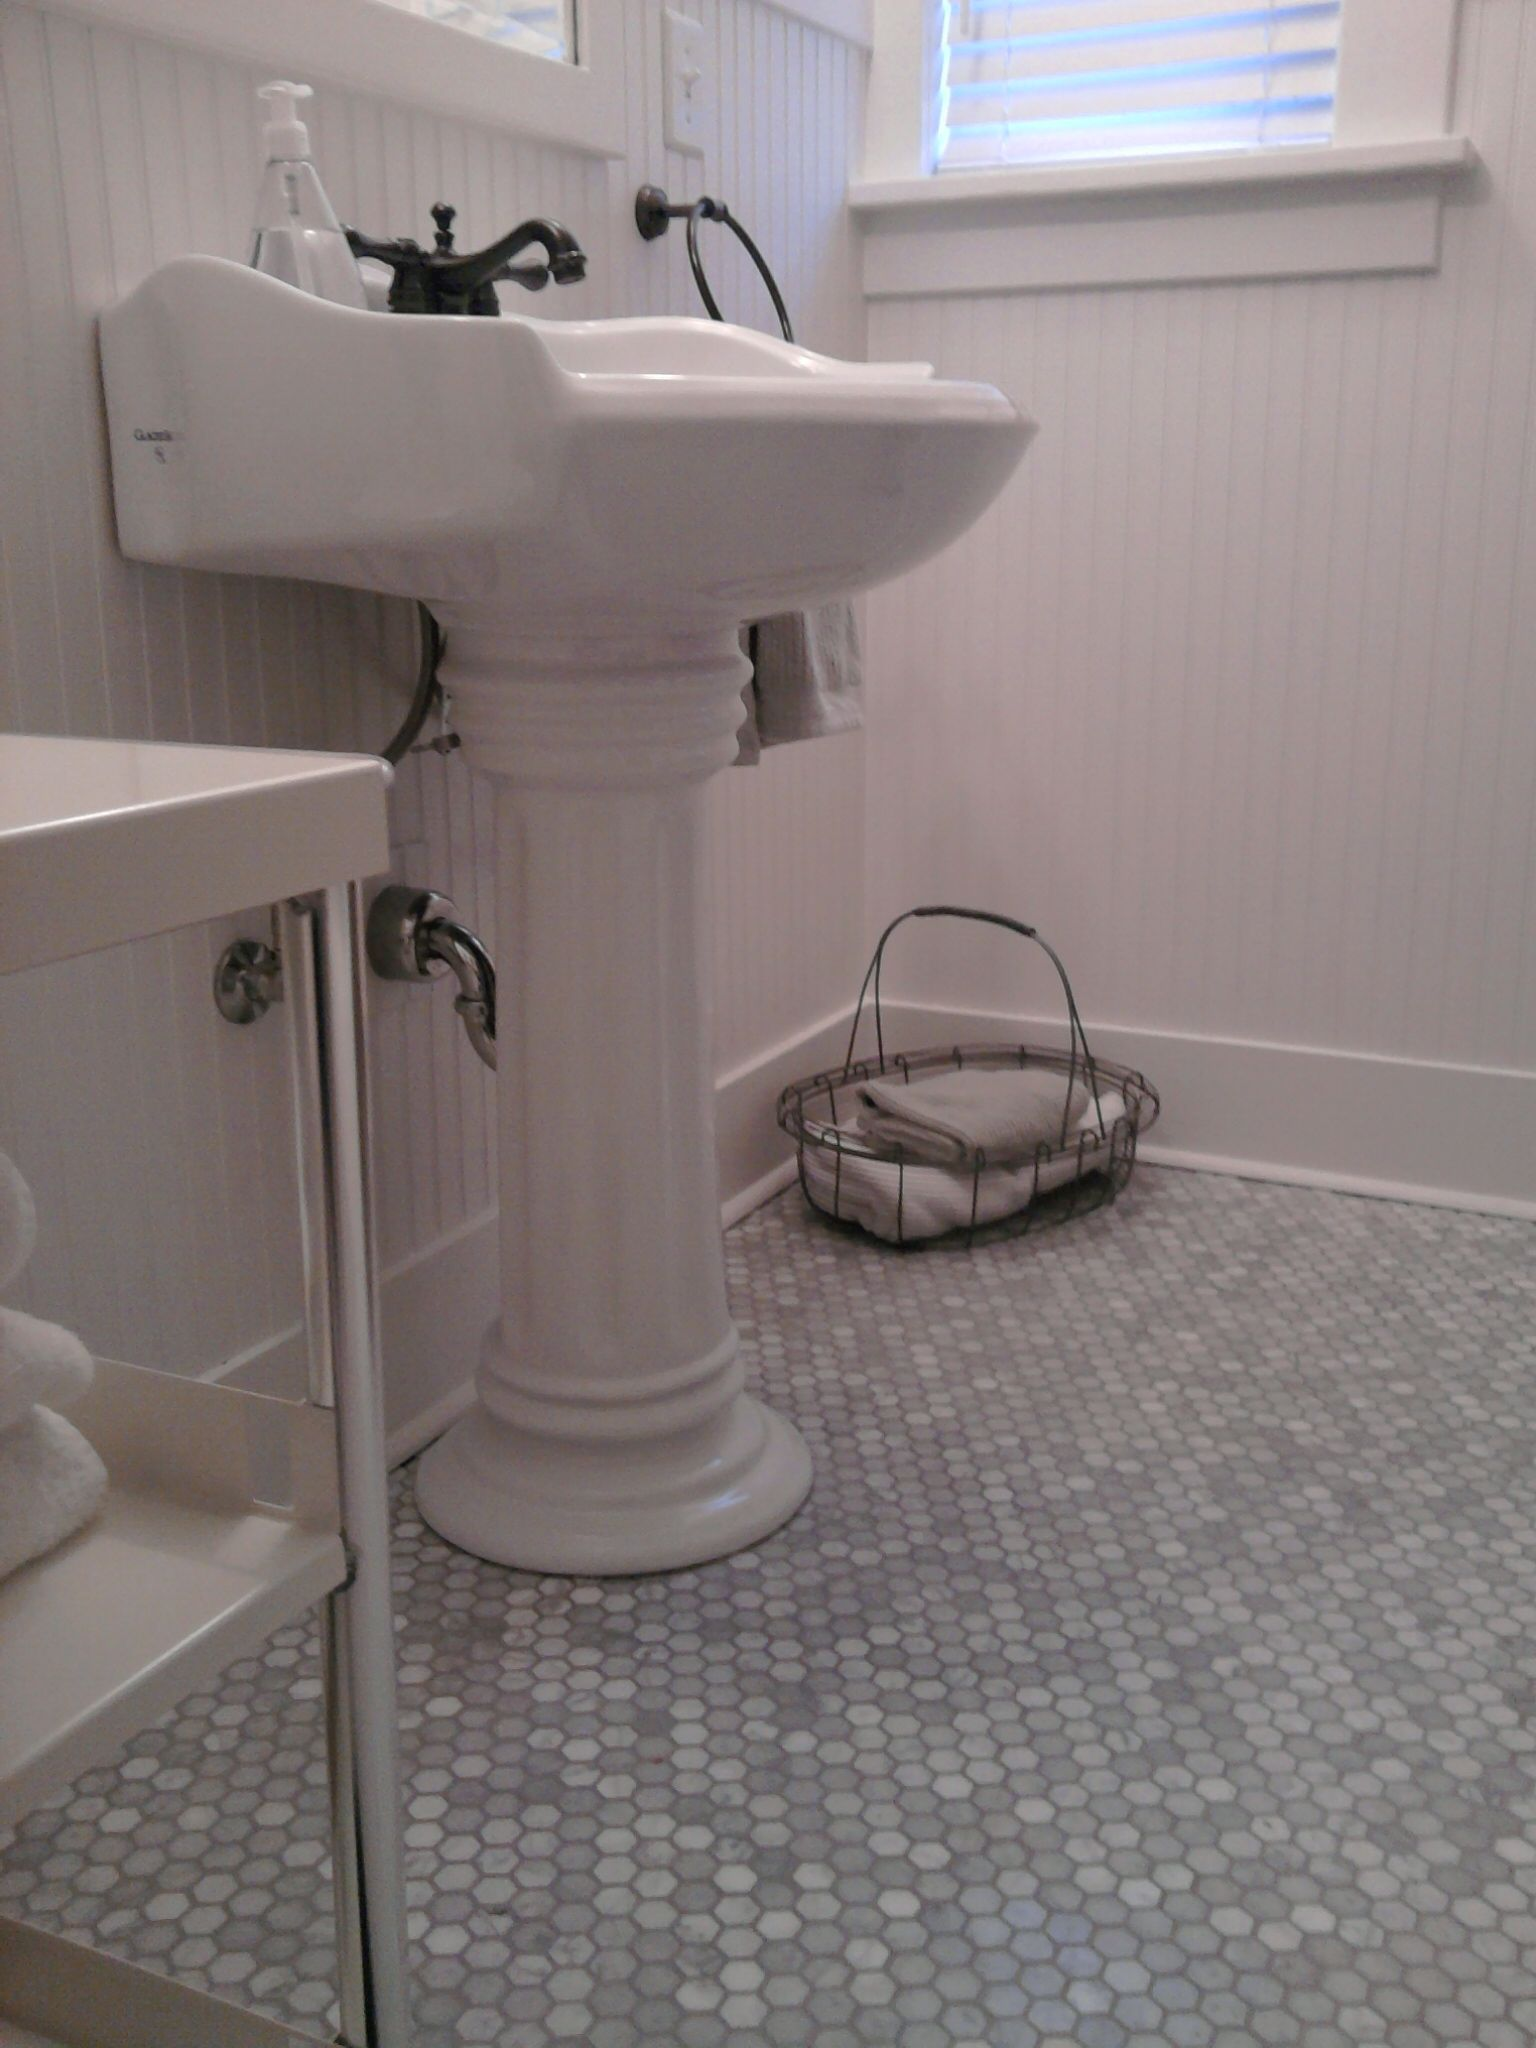 Hex Bathroom Tile   Marble Hex Tile.   Old School Renovations, Inc.